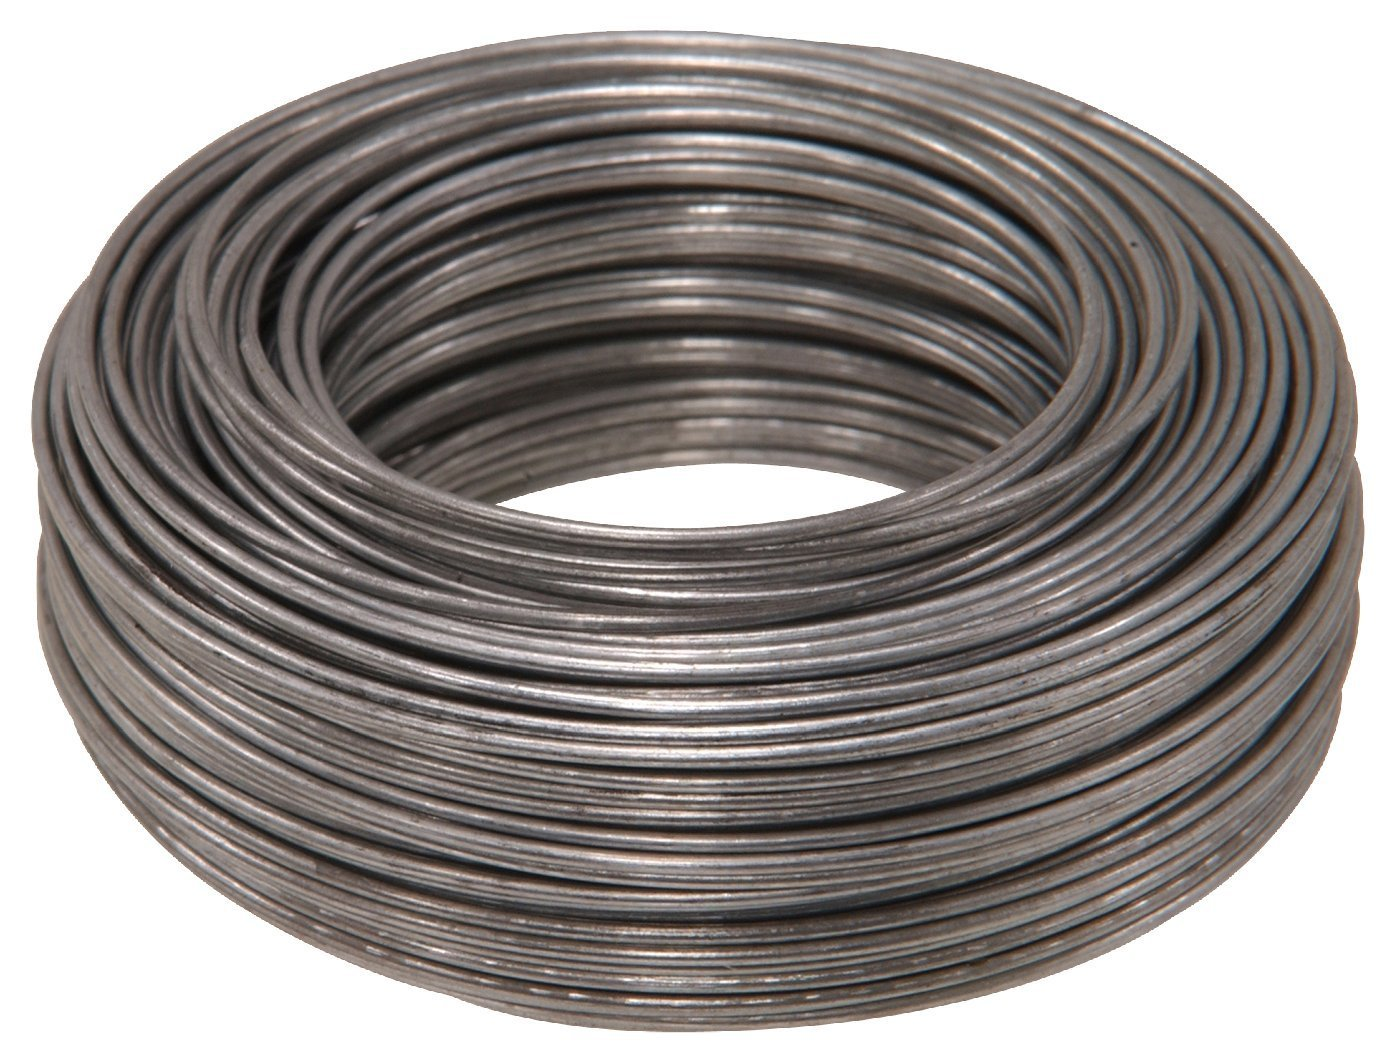 The Hillman Group 123105 Galvanized Steel Wire 110-Feet